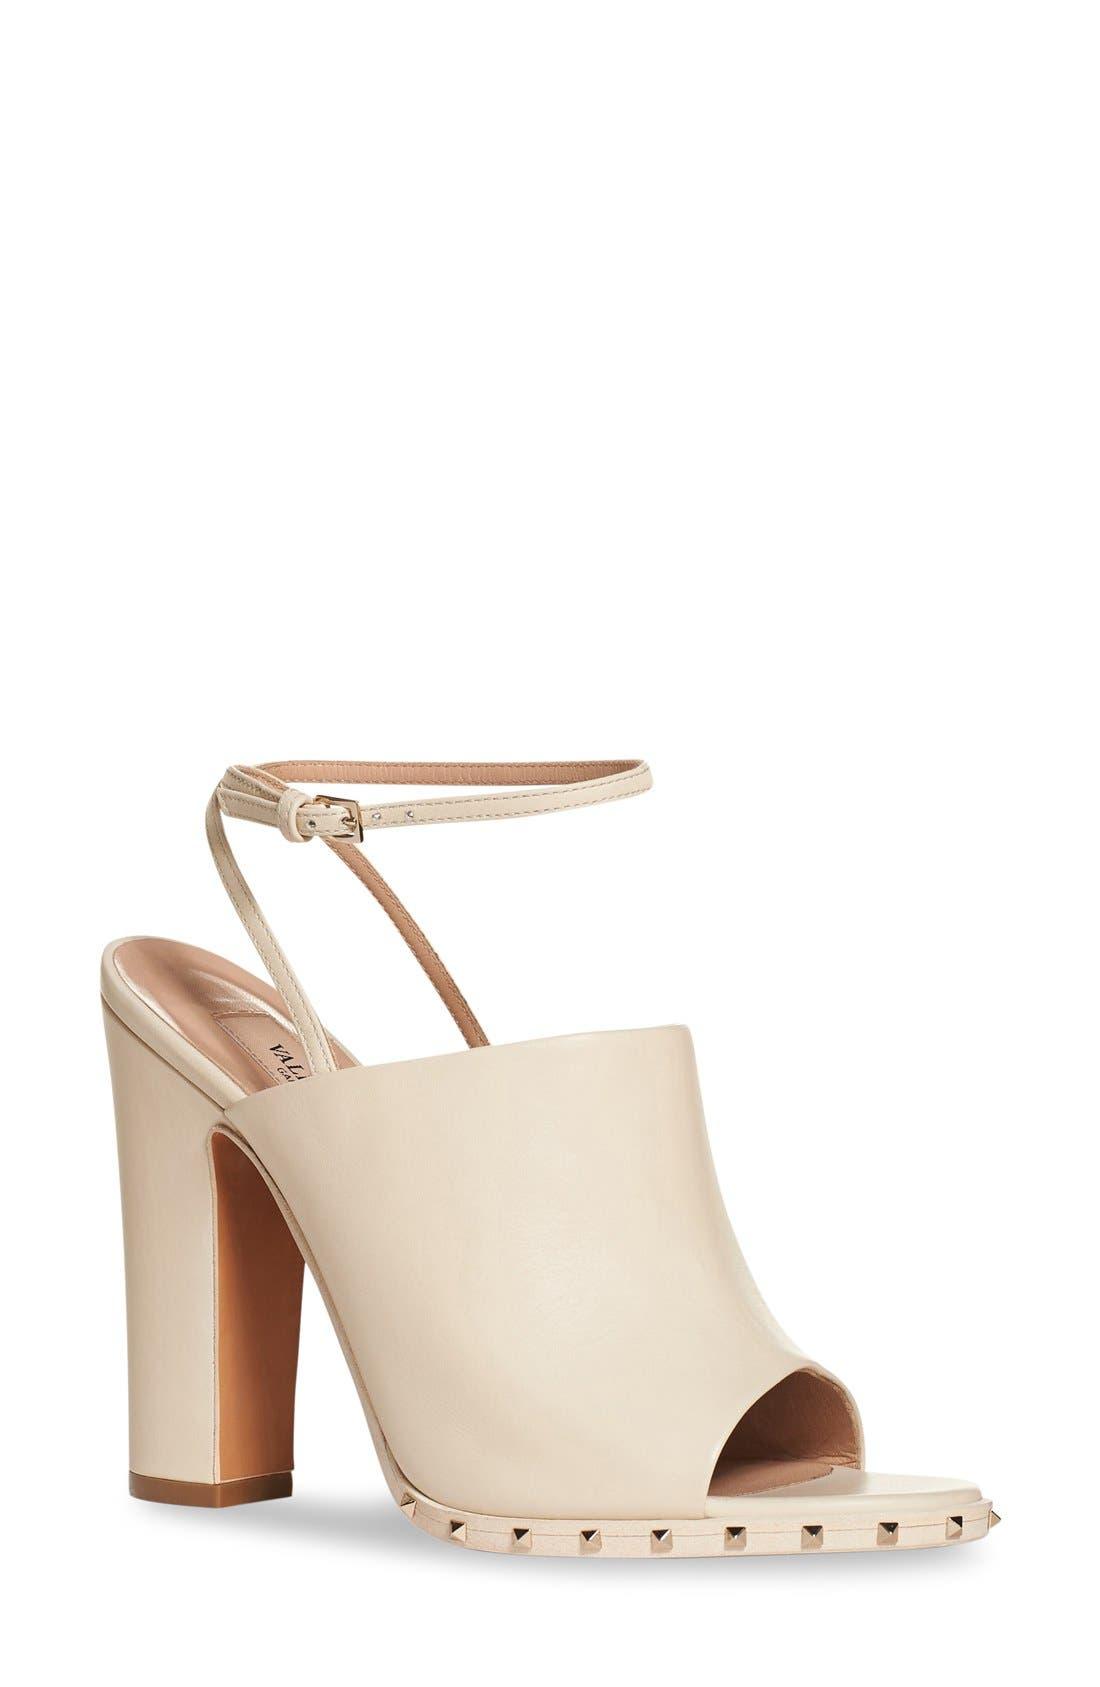 Main Image - Valentino 'Soul Stud' Peep Toe Sandal (Women)